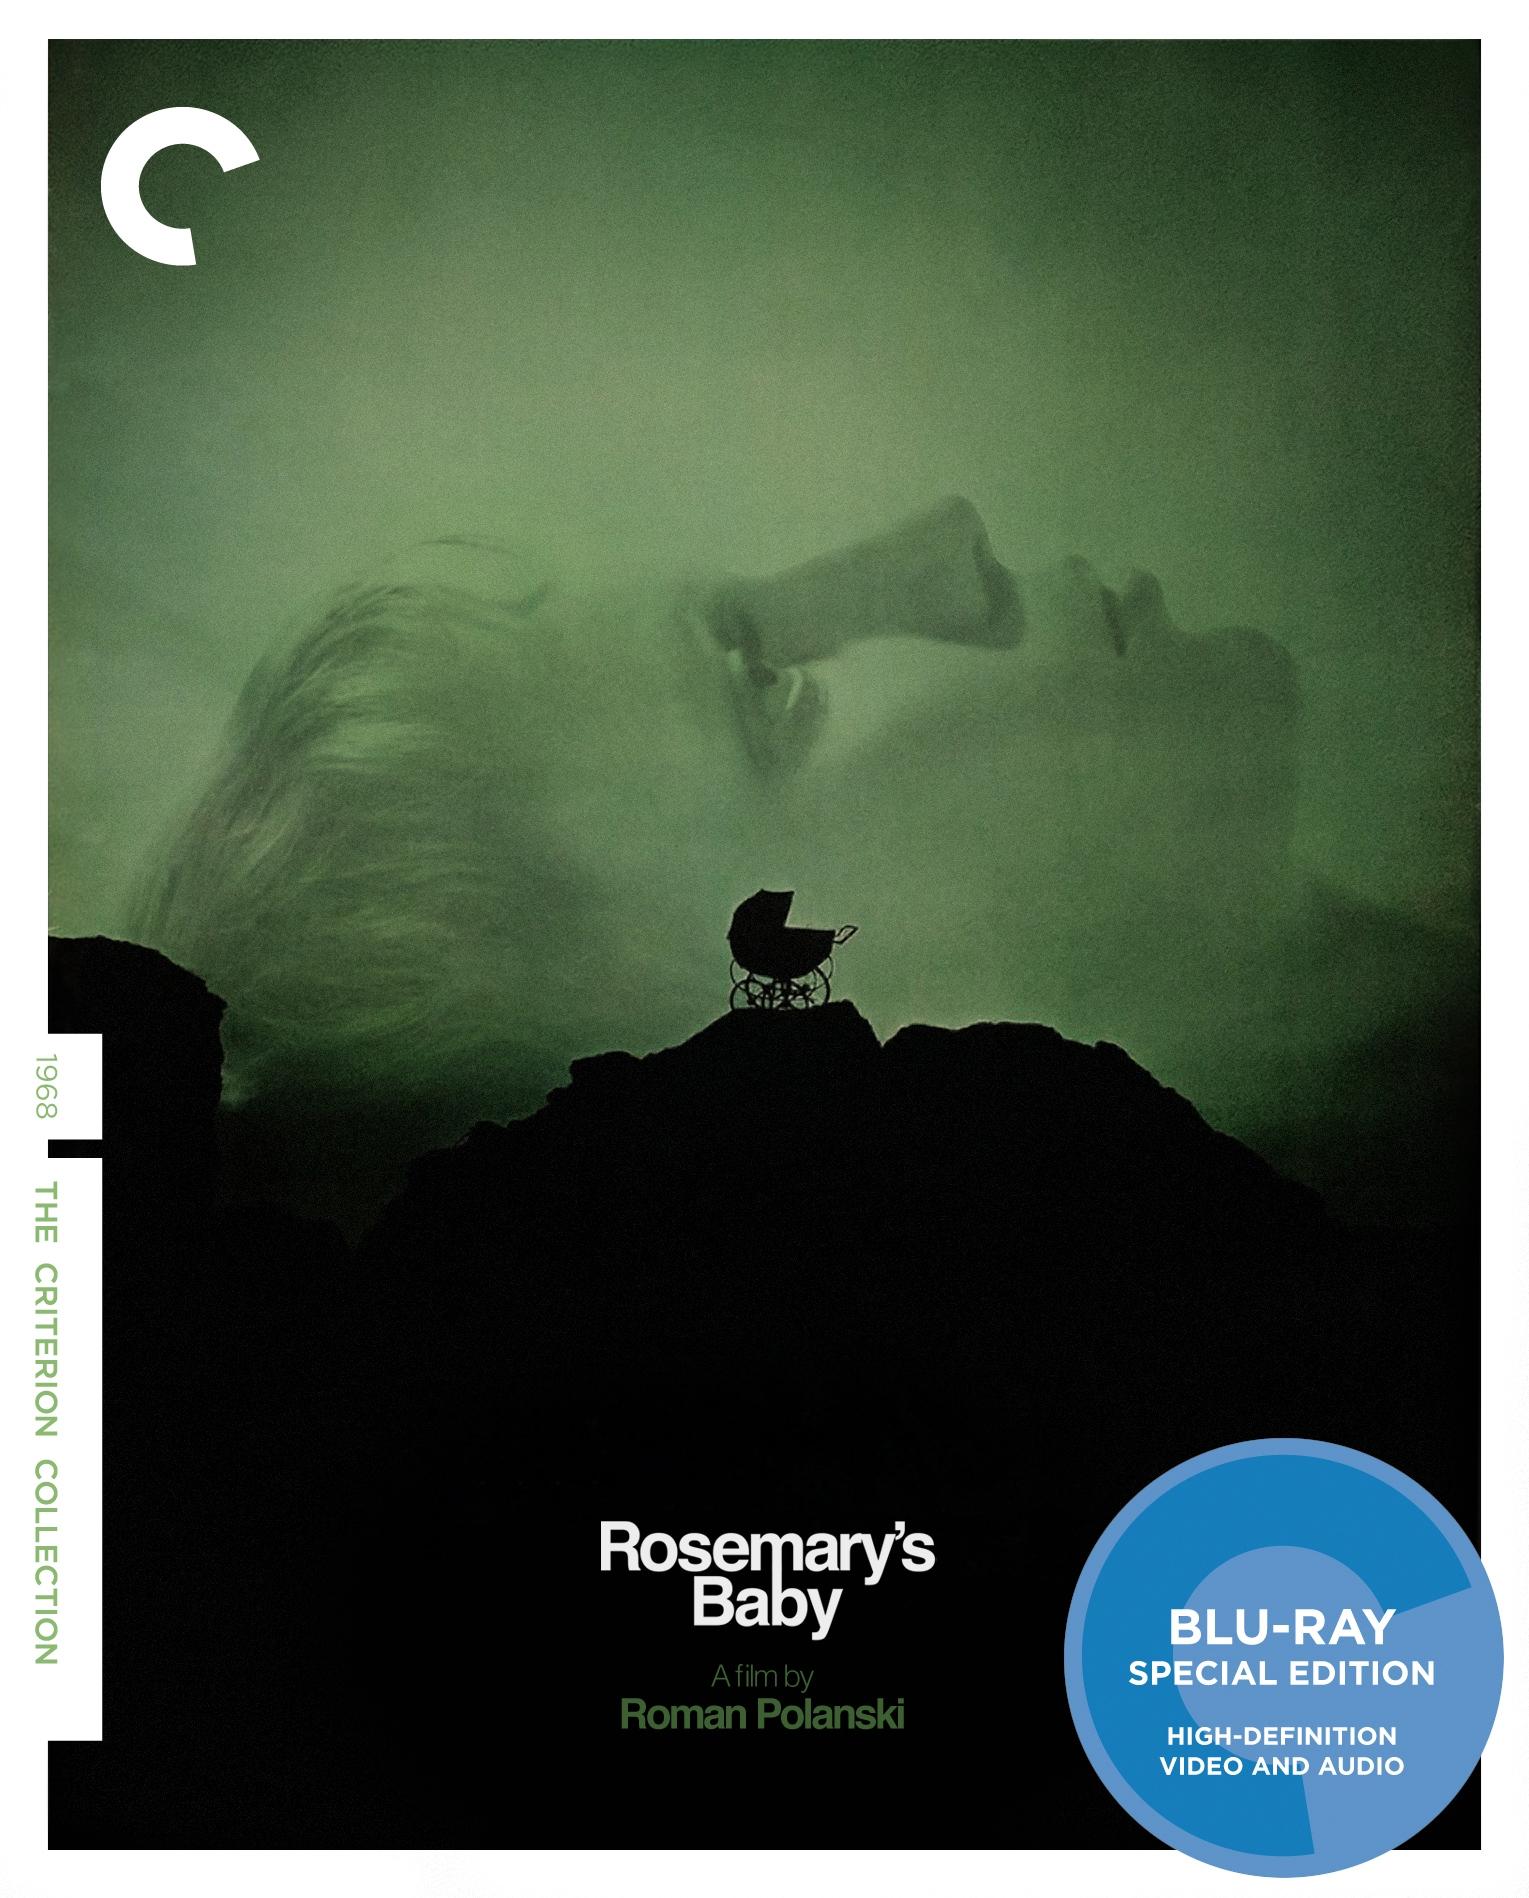 Rosemary's Baby (Blu-ray Disc)